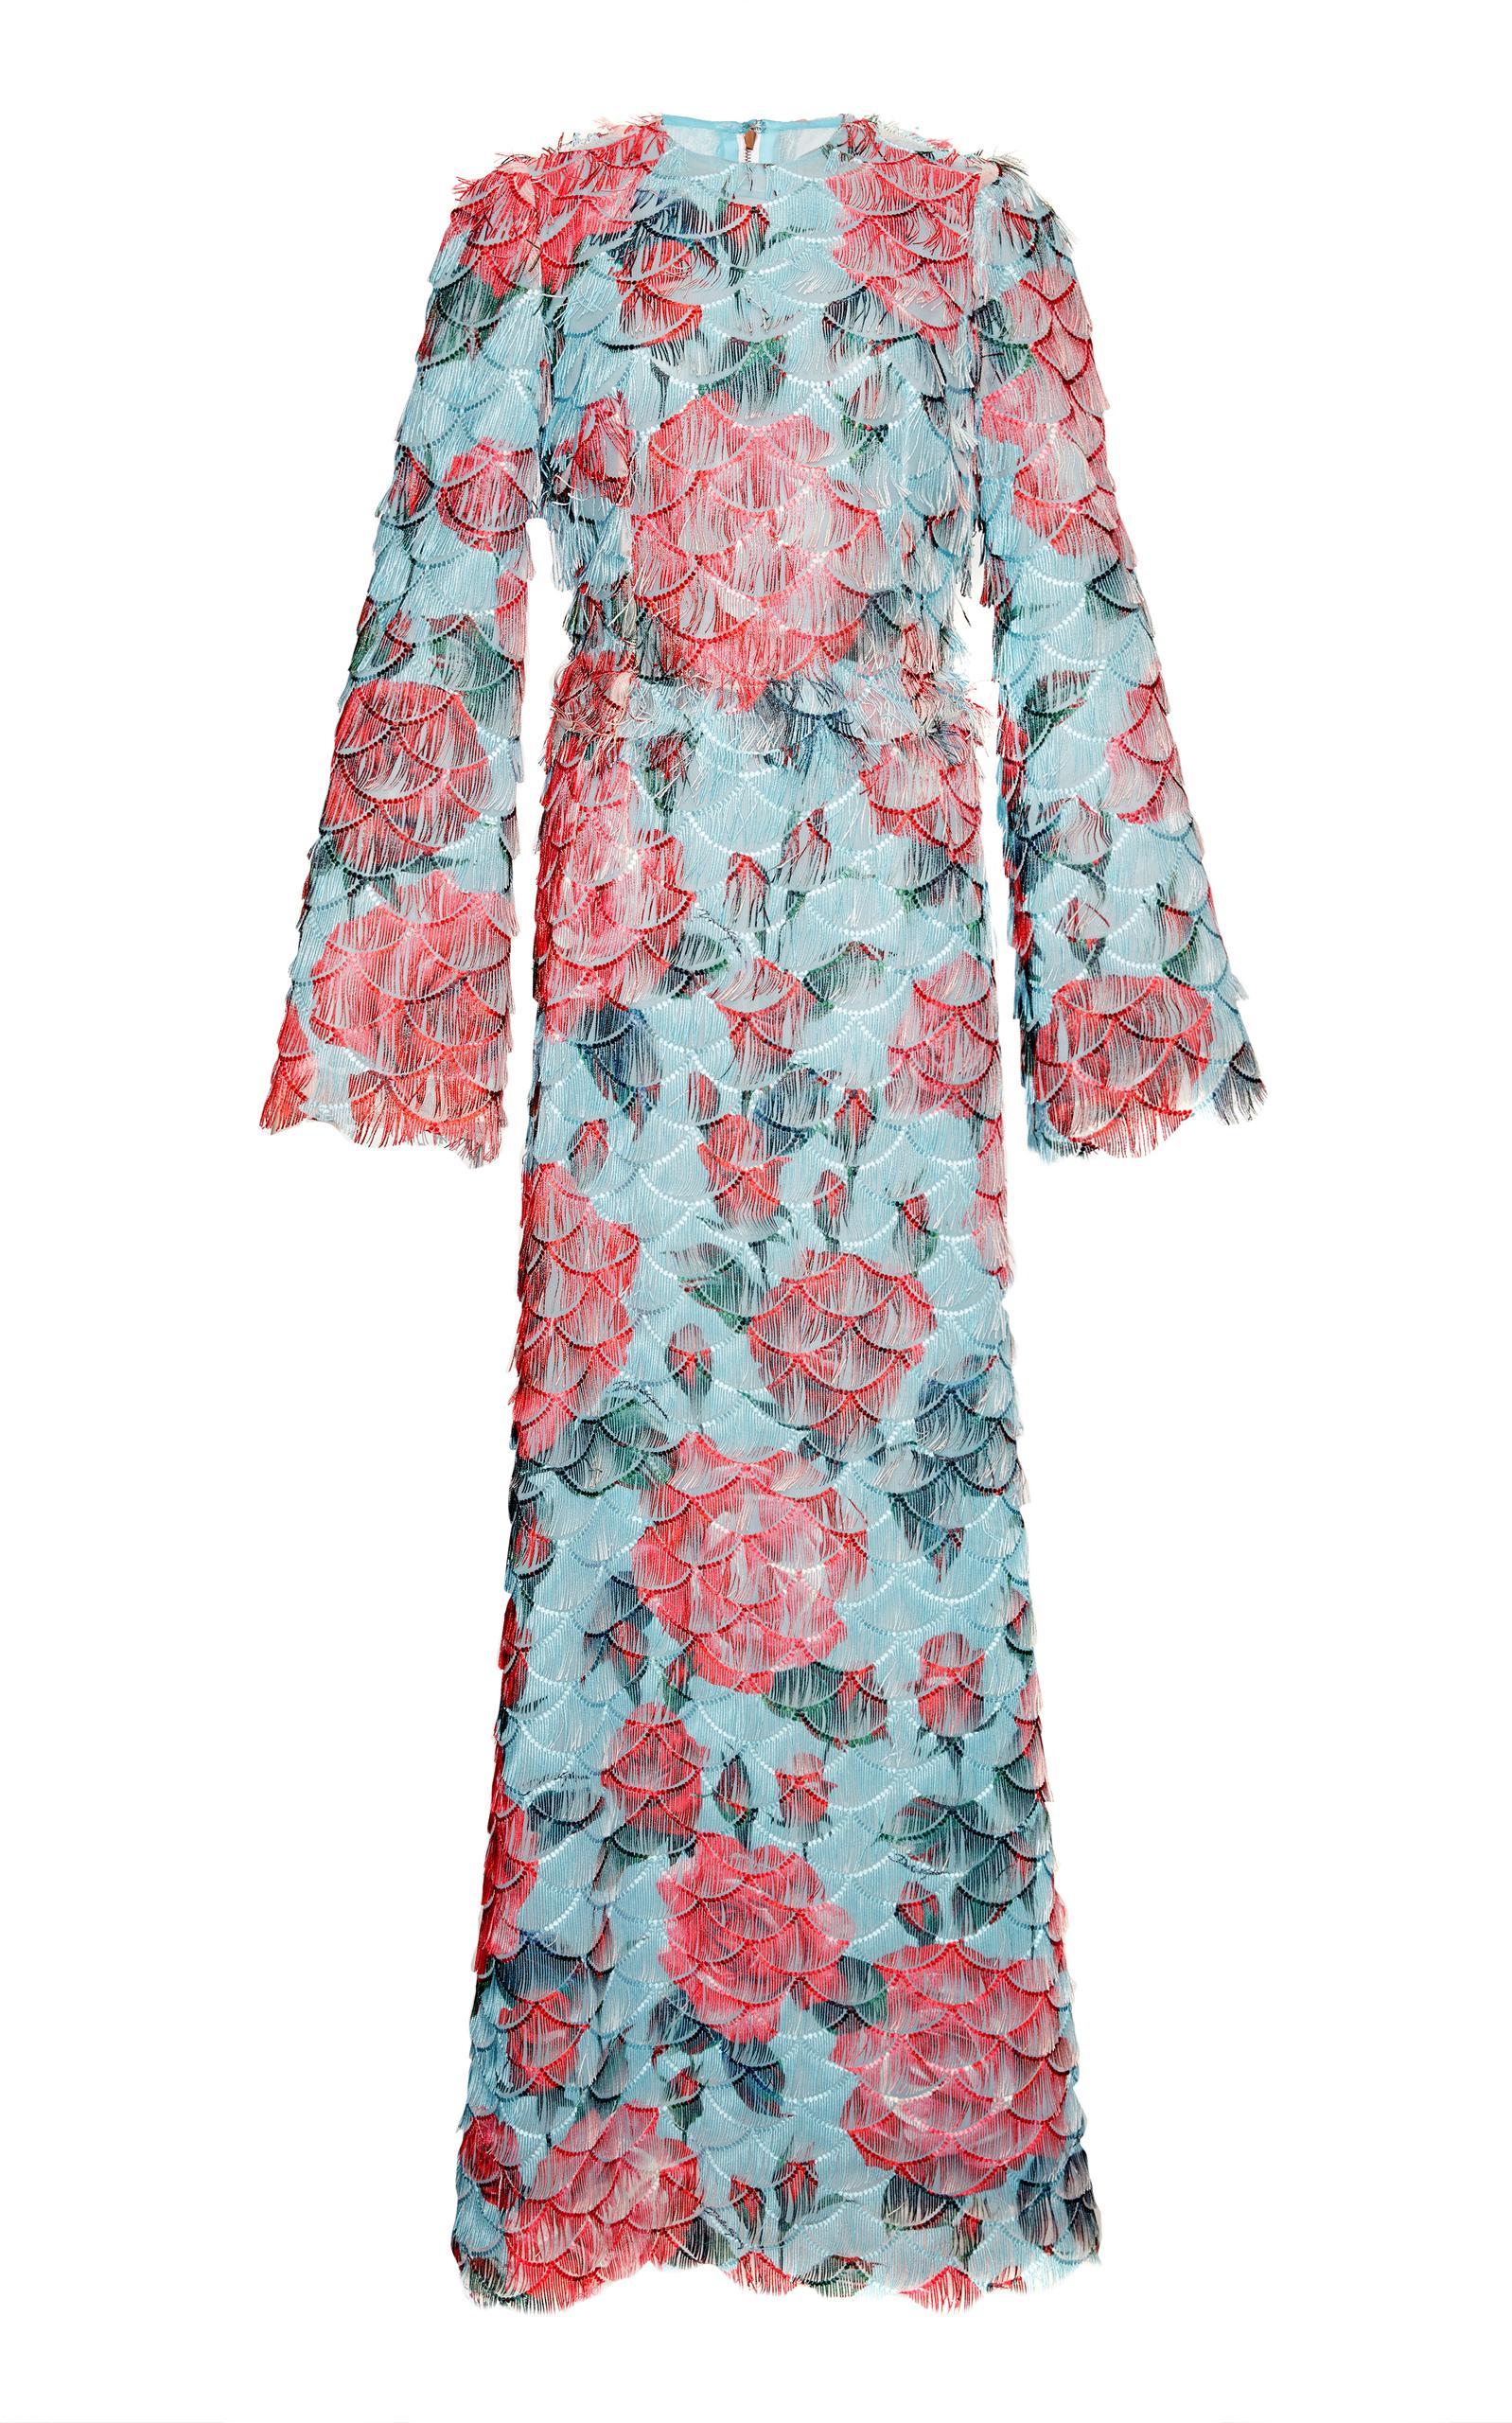 Dolce & Gabbana Laser Cut Floral Dress In Blue